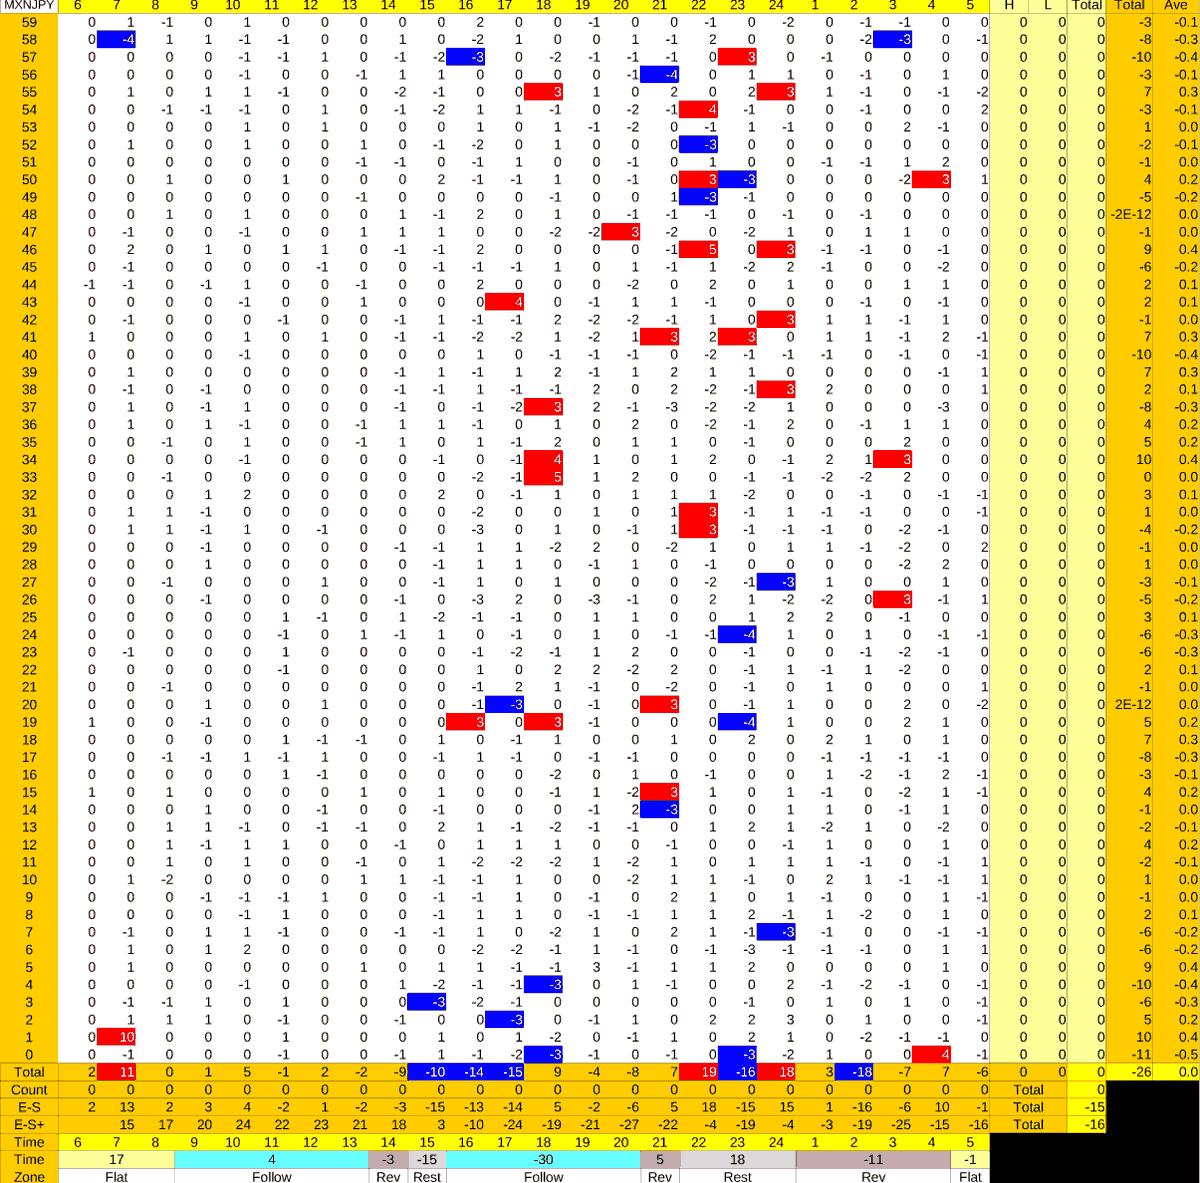 20210819_HS(3)MXNJPY